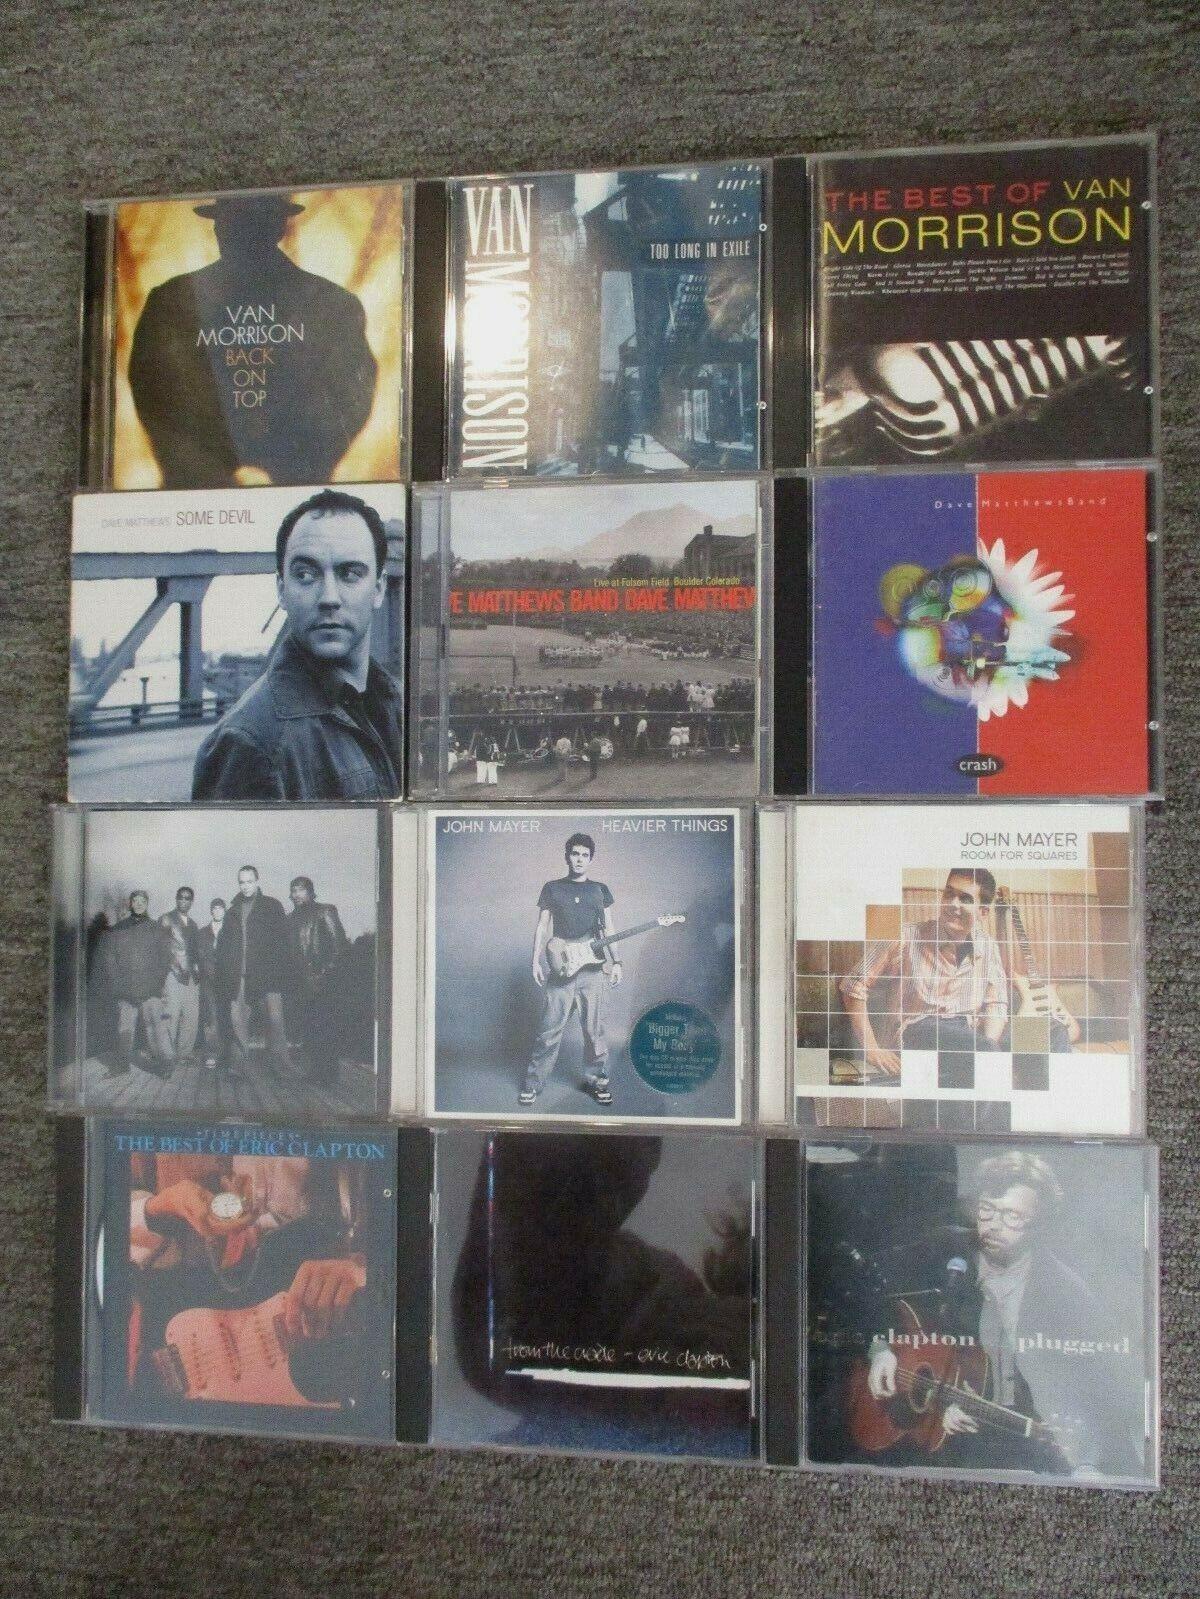 CD Lot Of 12 Eric Clapton Van Morrison John Mayer Dave Matthews